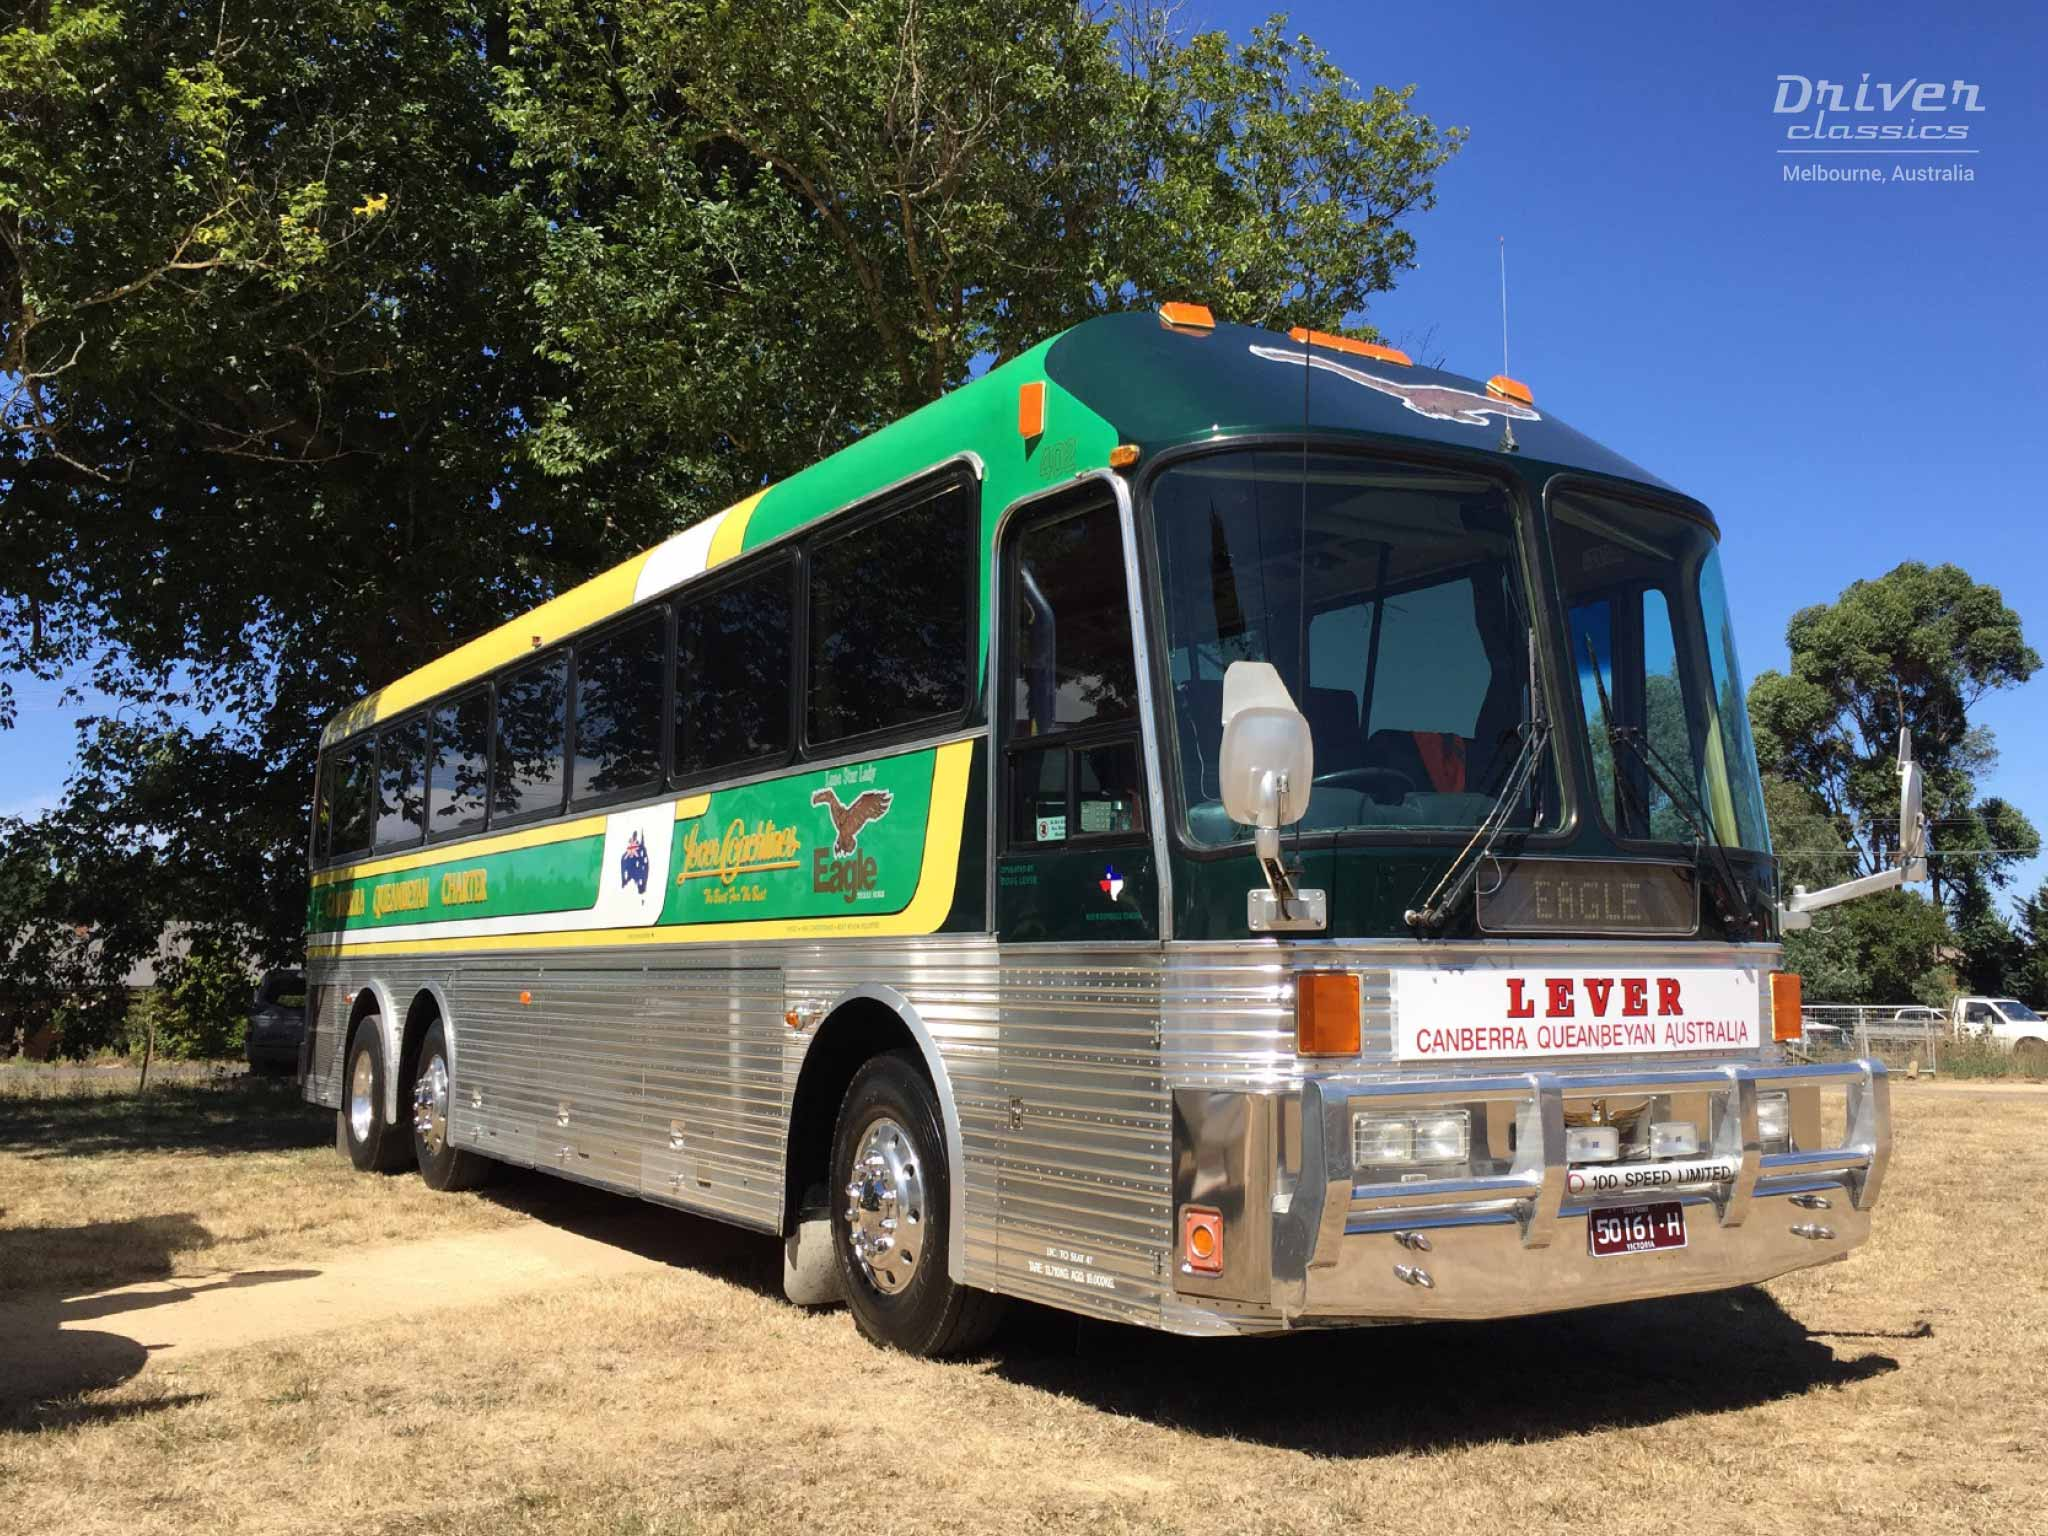 1989 Eagle Model 20 Bus, Lancefield Victoria